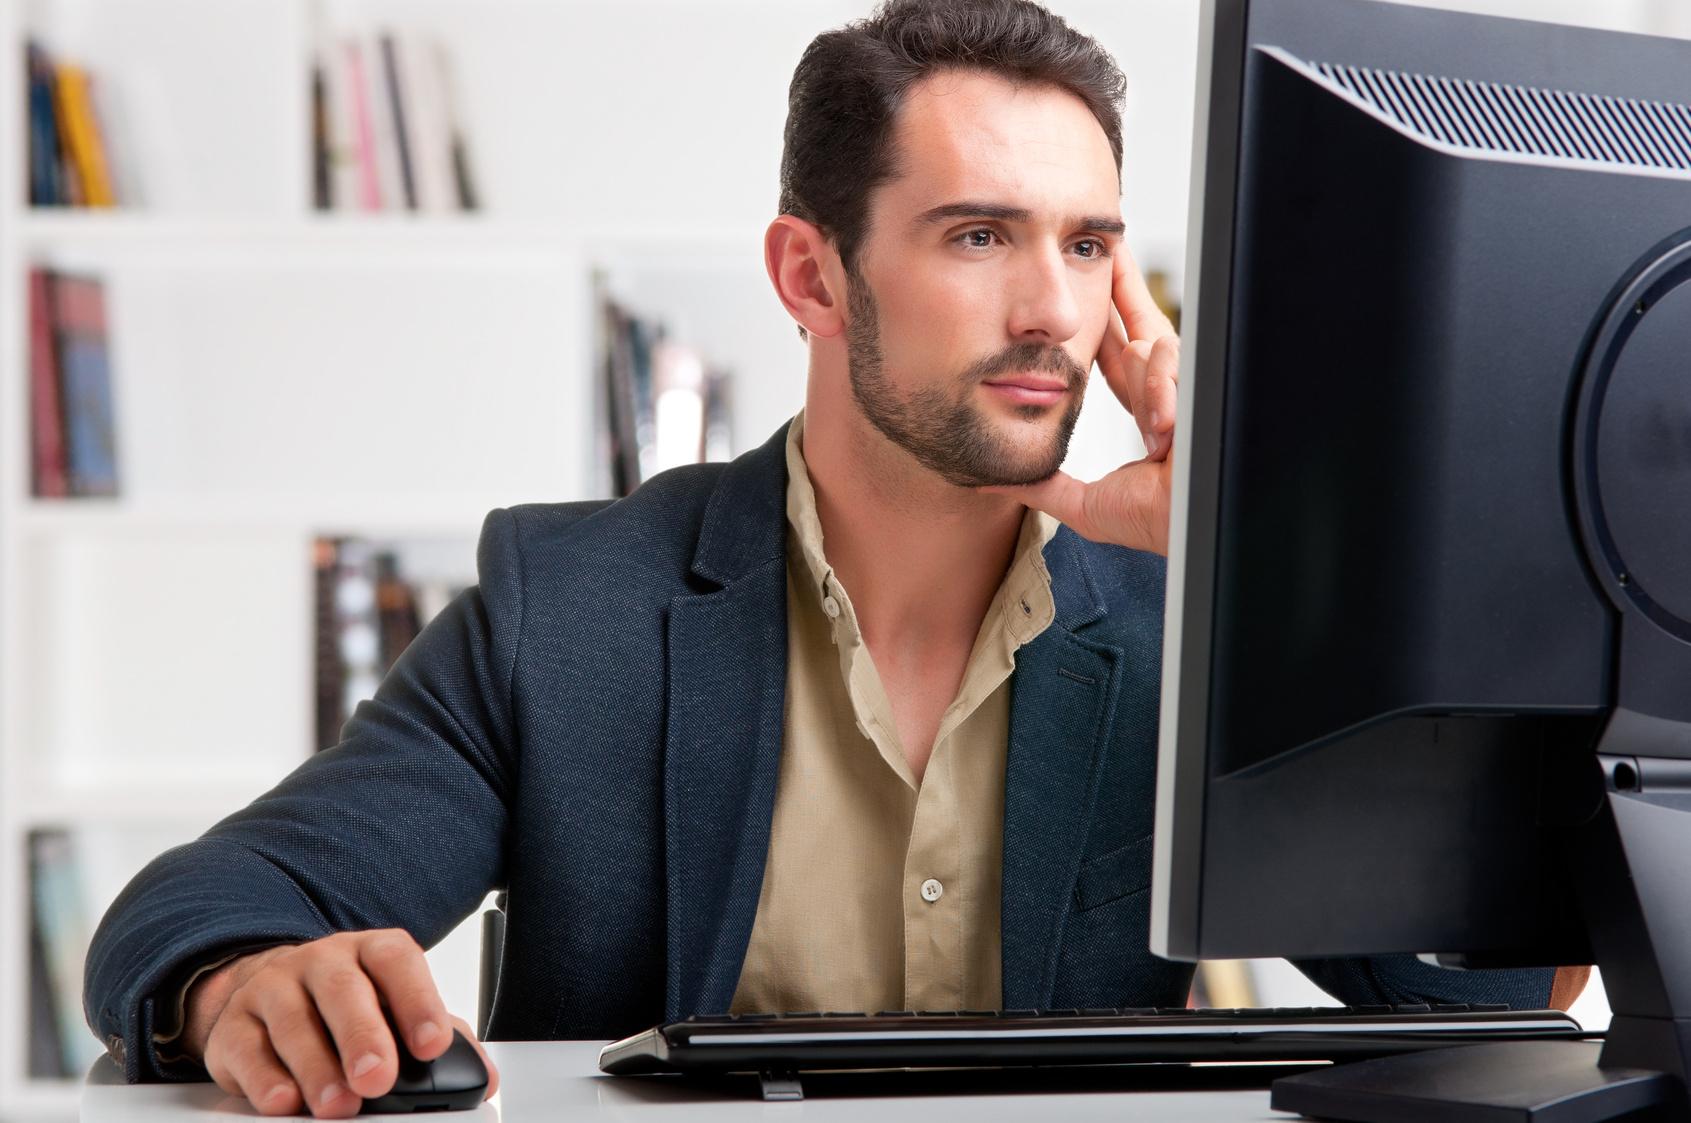 desktop_pc_man_computer